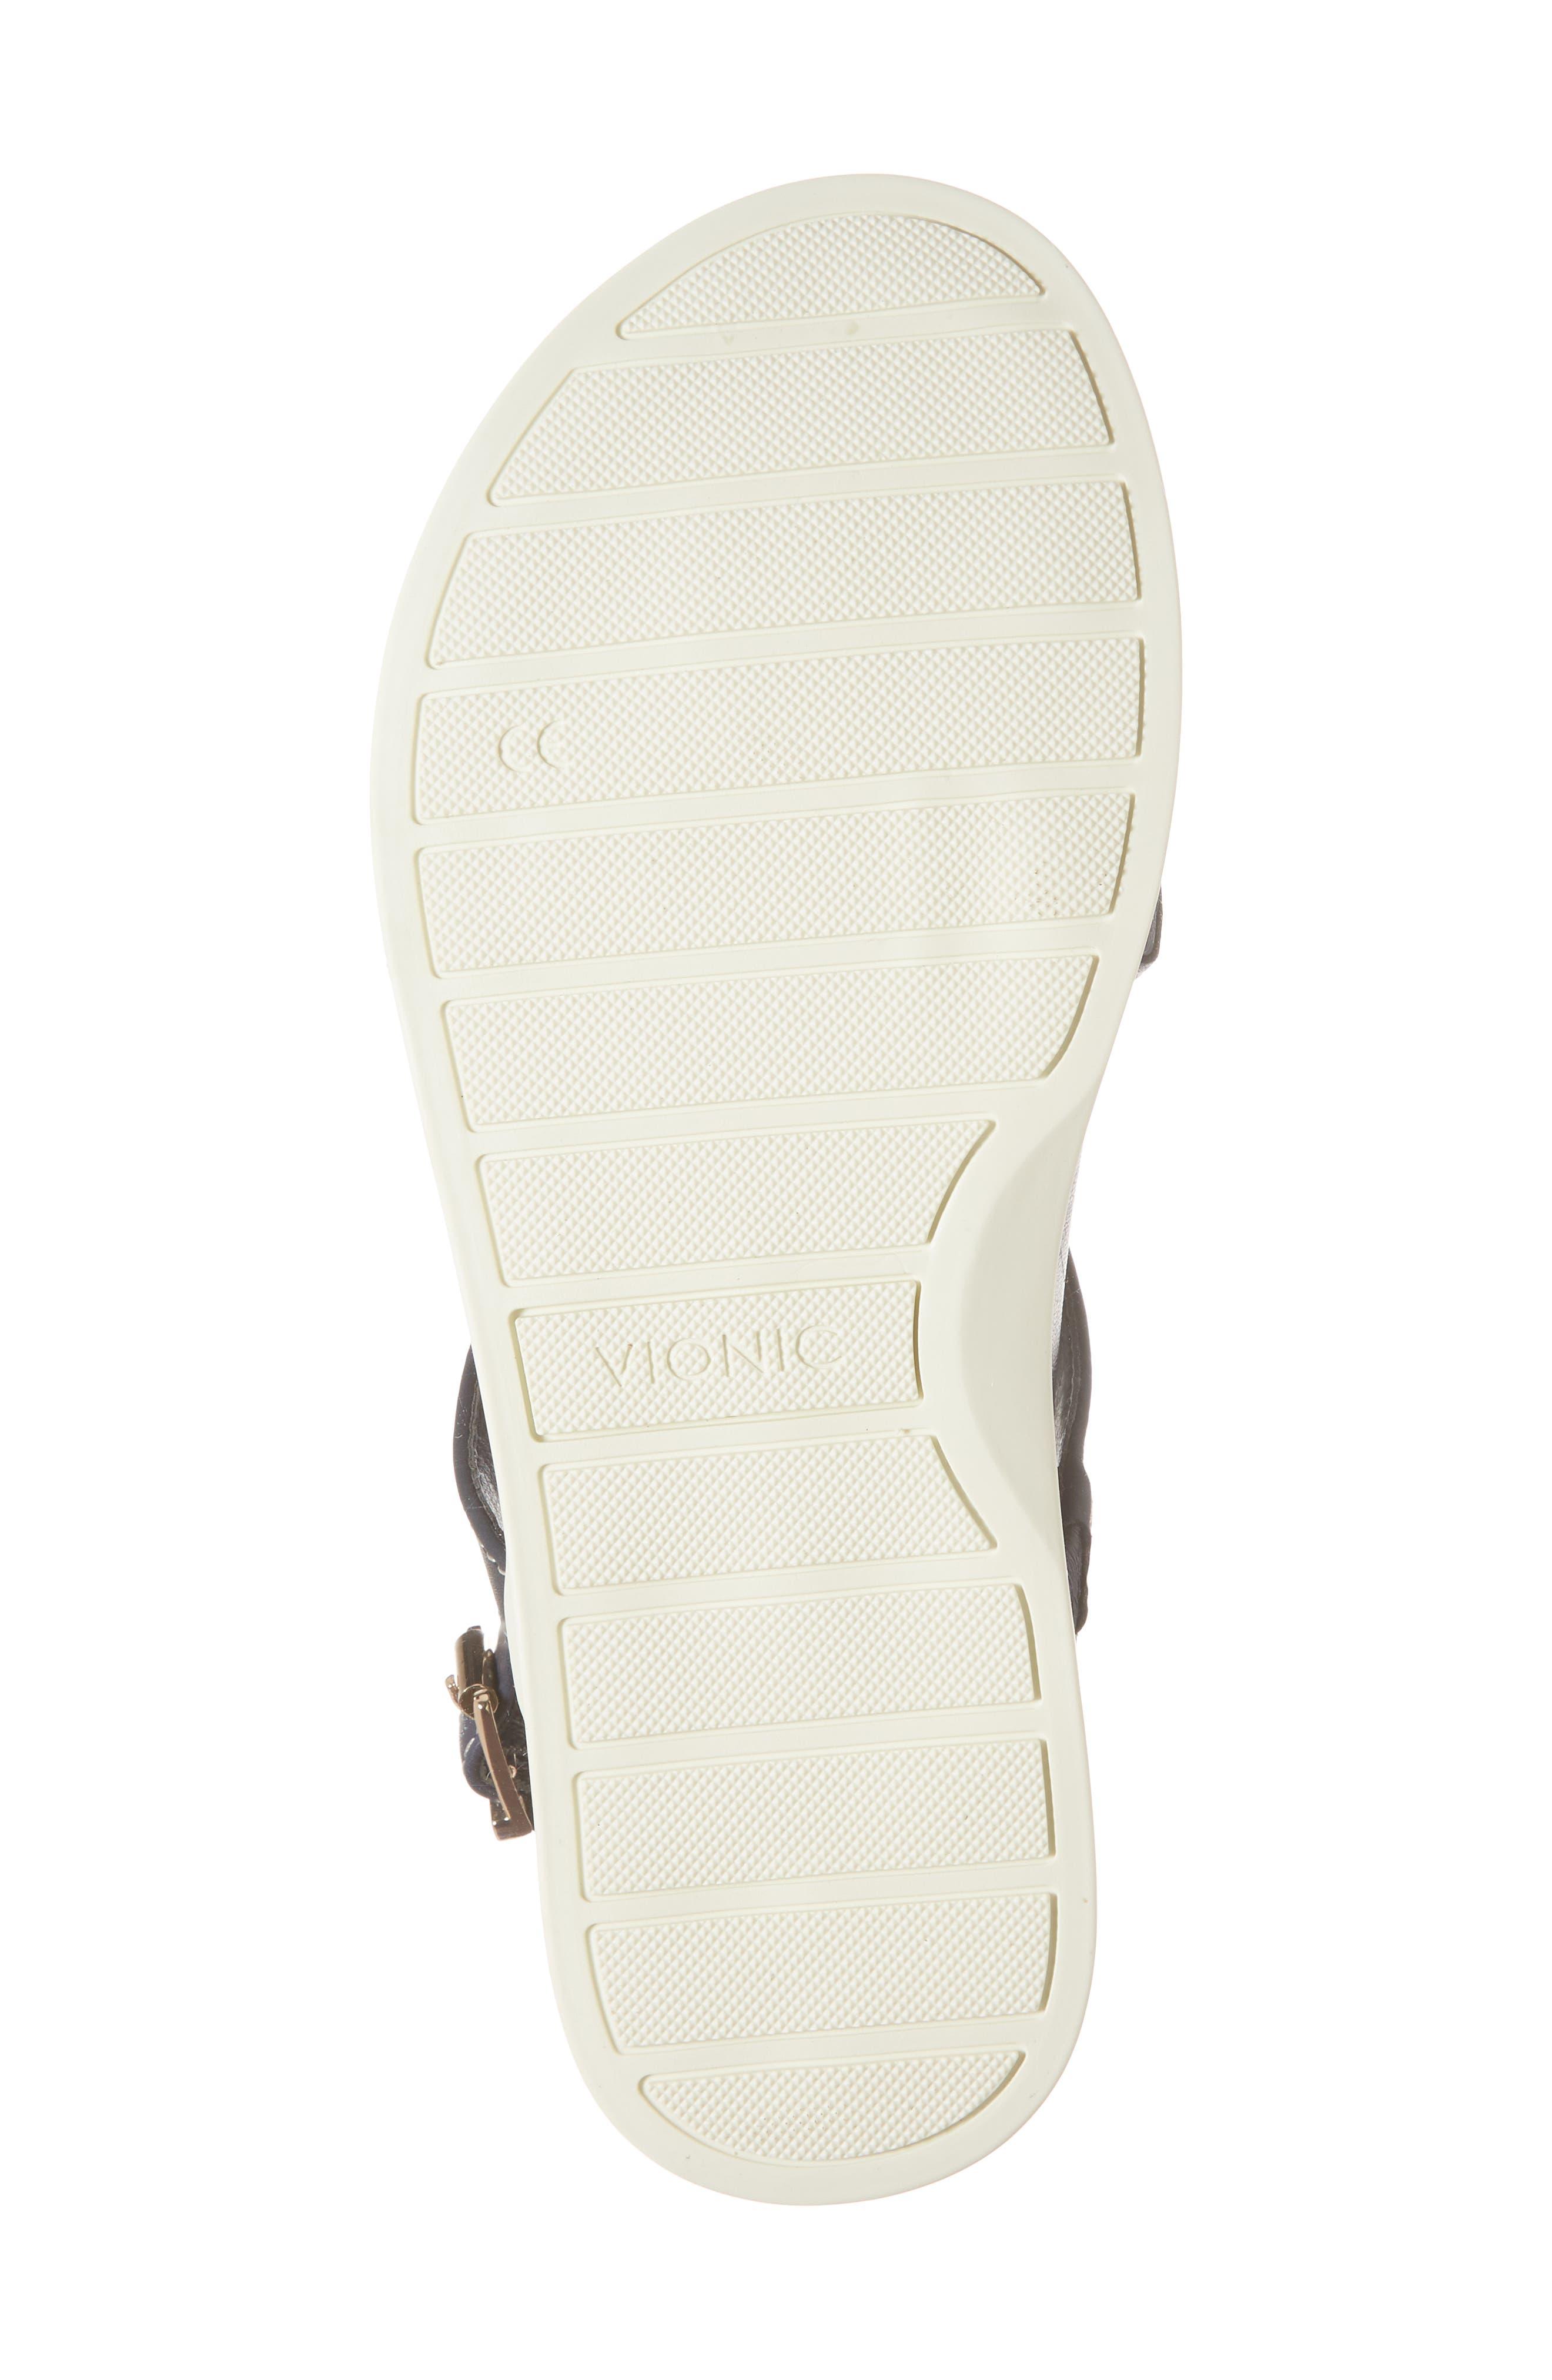 Veranda Orthaheel<sup>®</sup> Sandal,                             Alternate thumbnail 3, color,                             Navy Leather